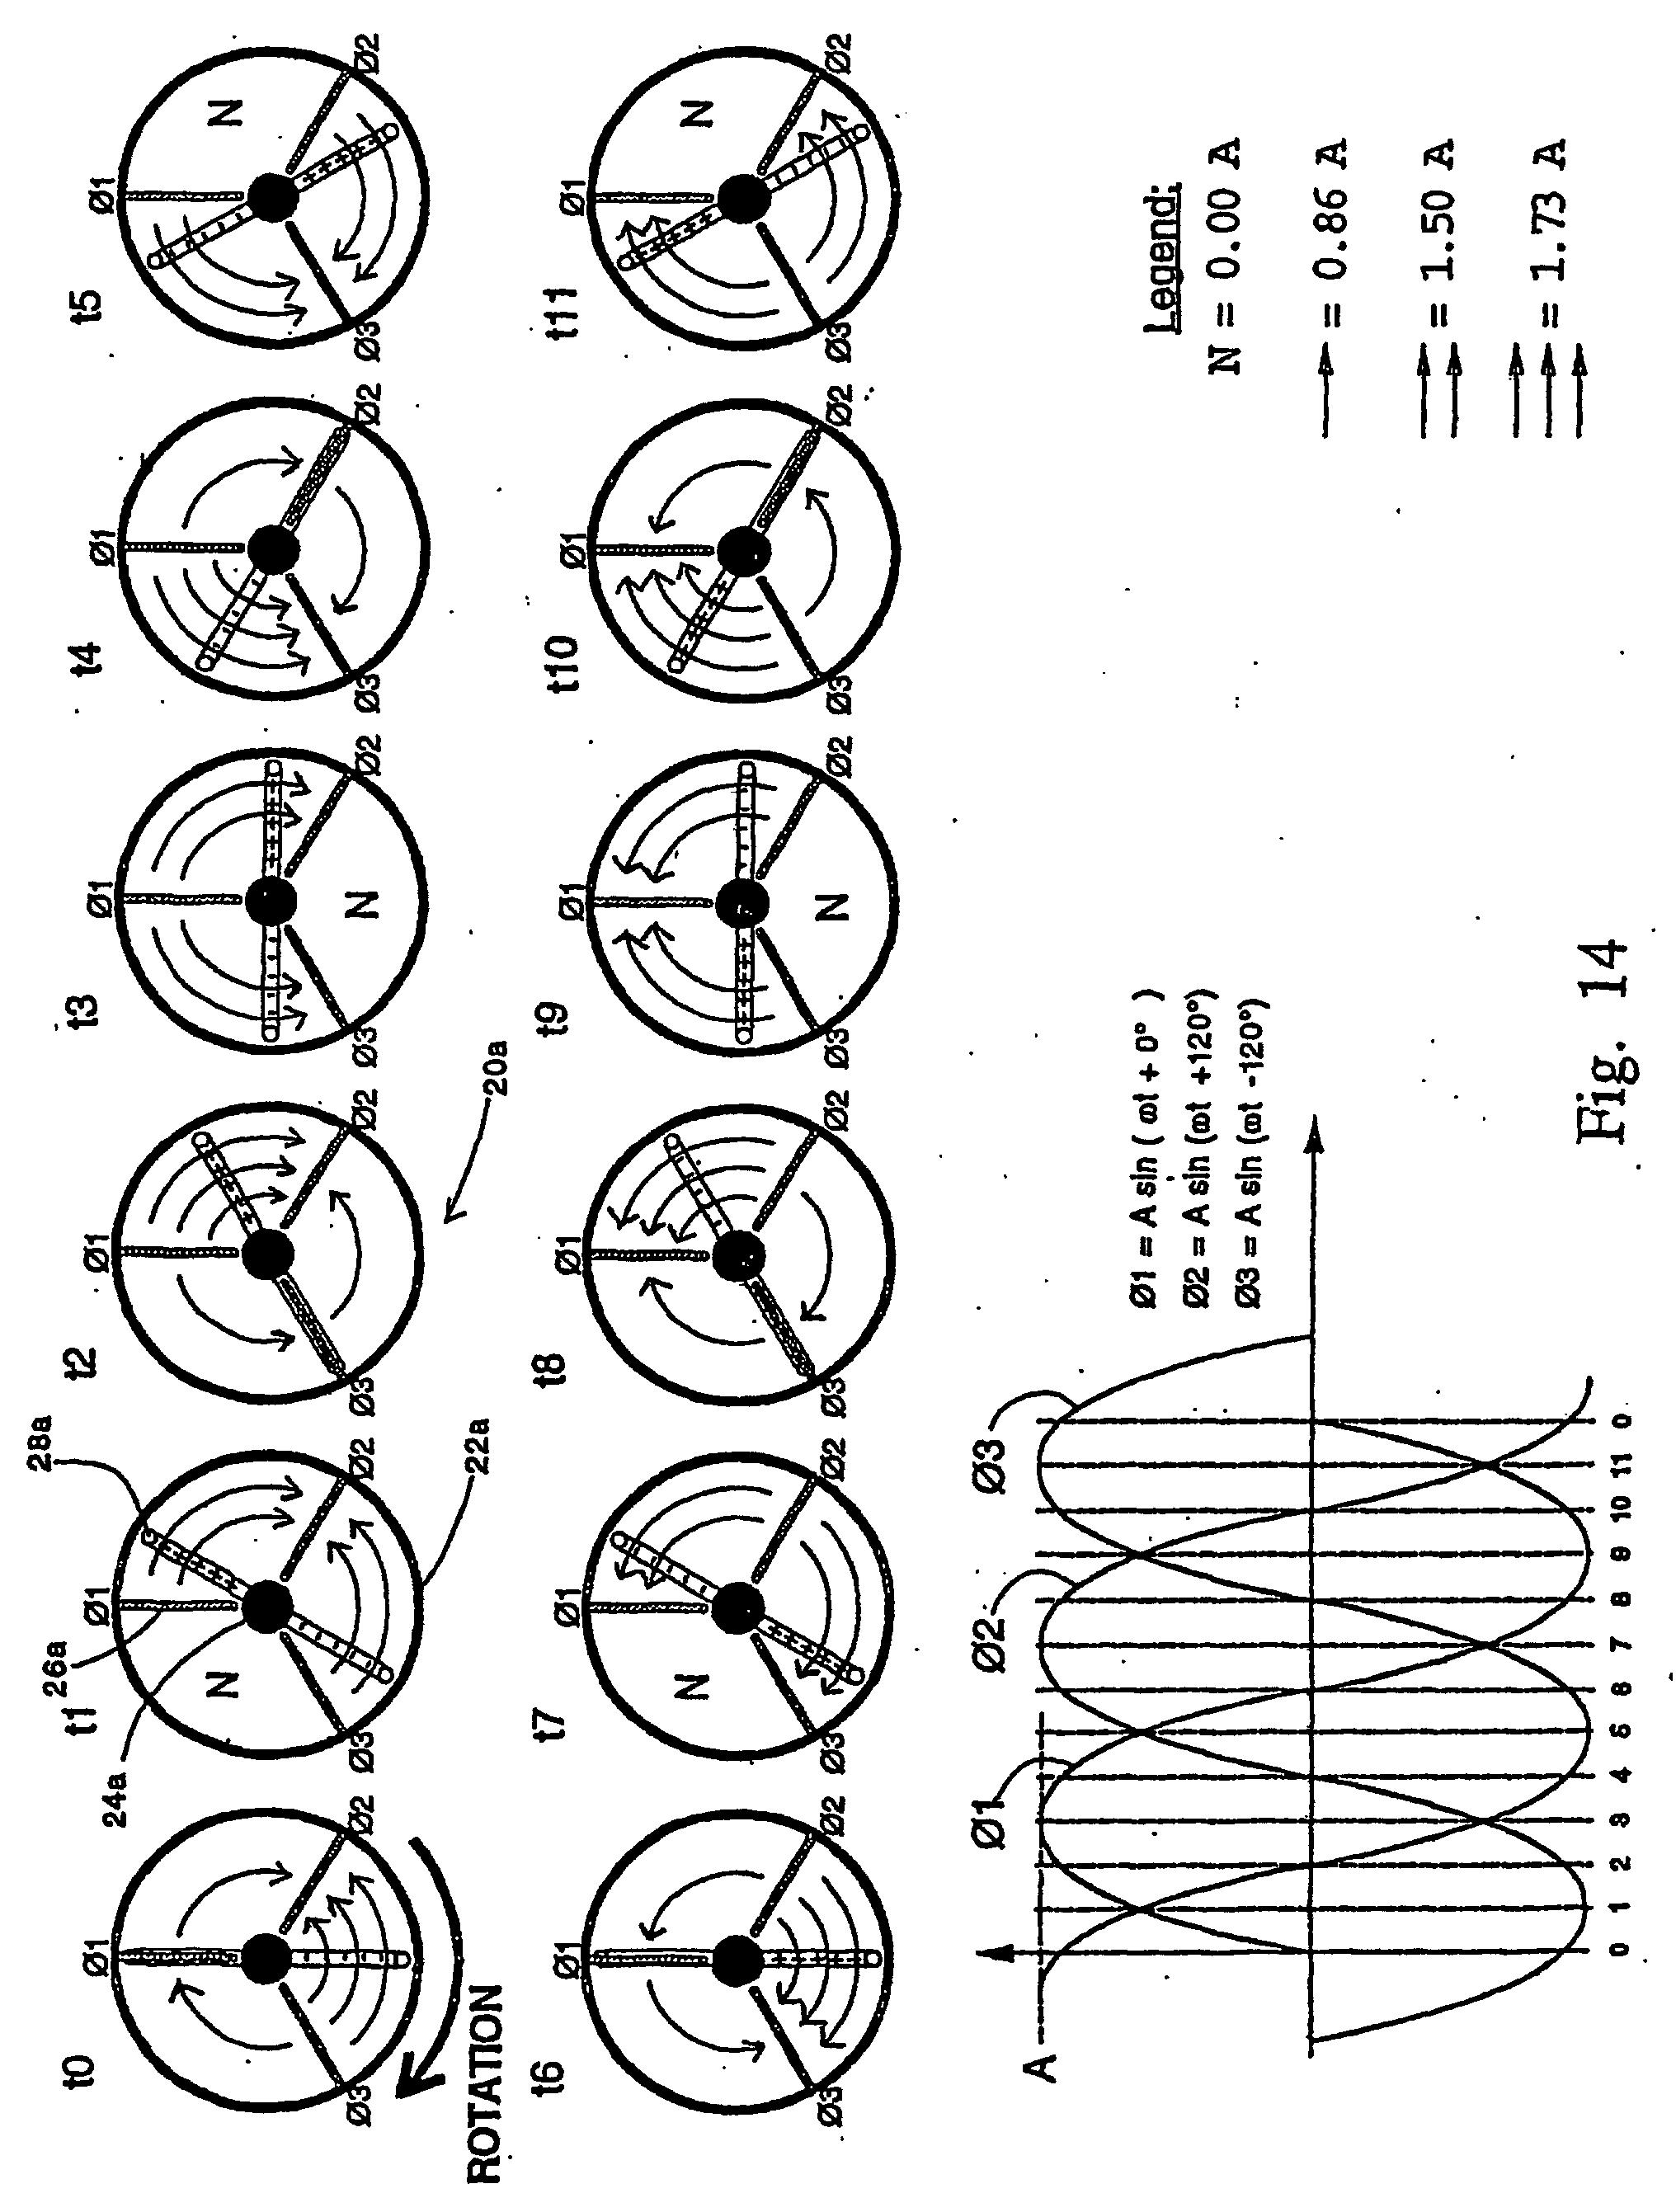 patent ep1368888b1 moteur electrostatique tres efficace. Black Bedroom Furniture Sets. Home Design Ideas